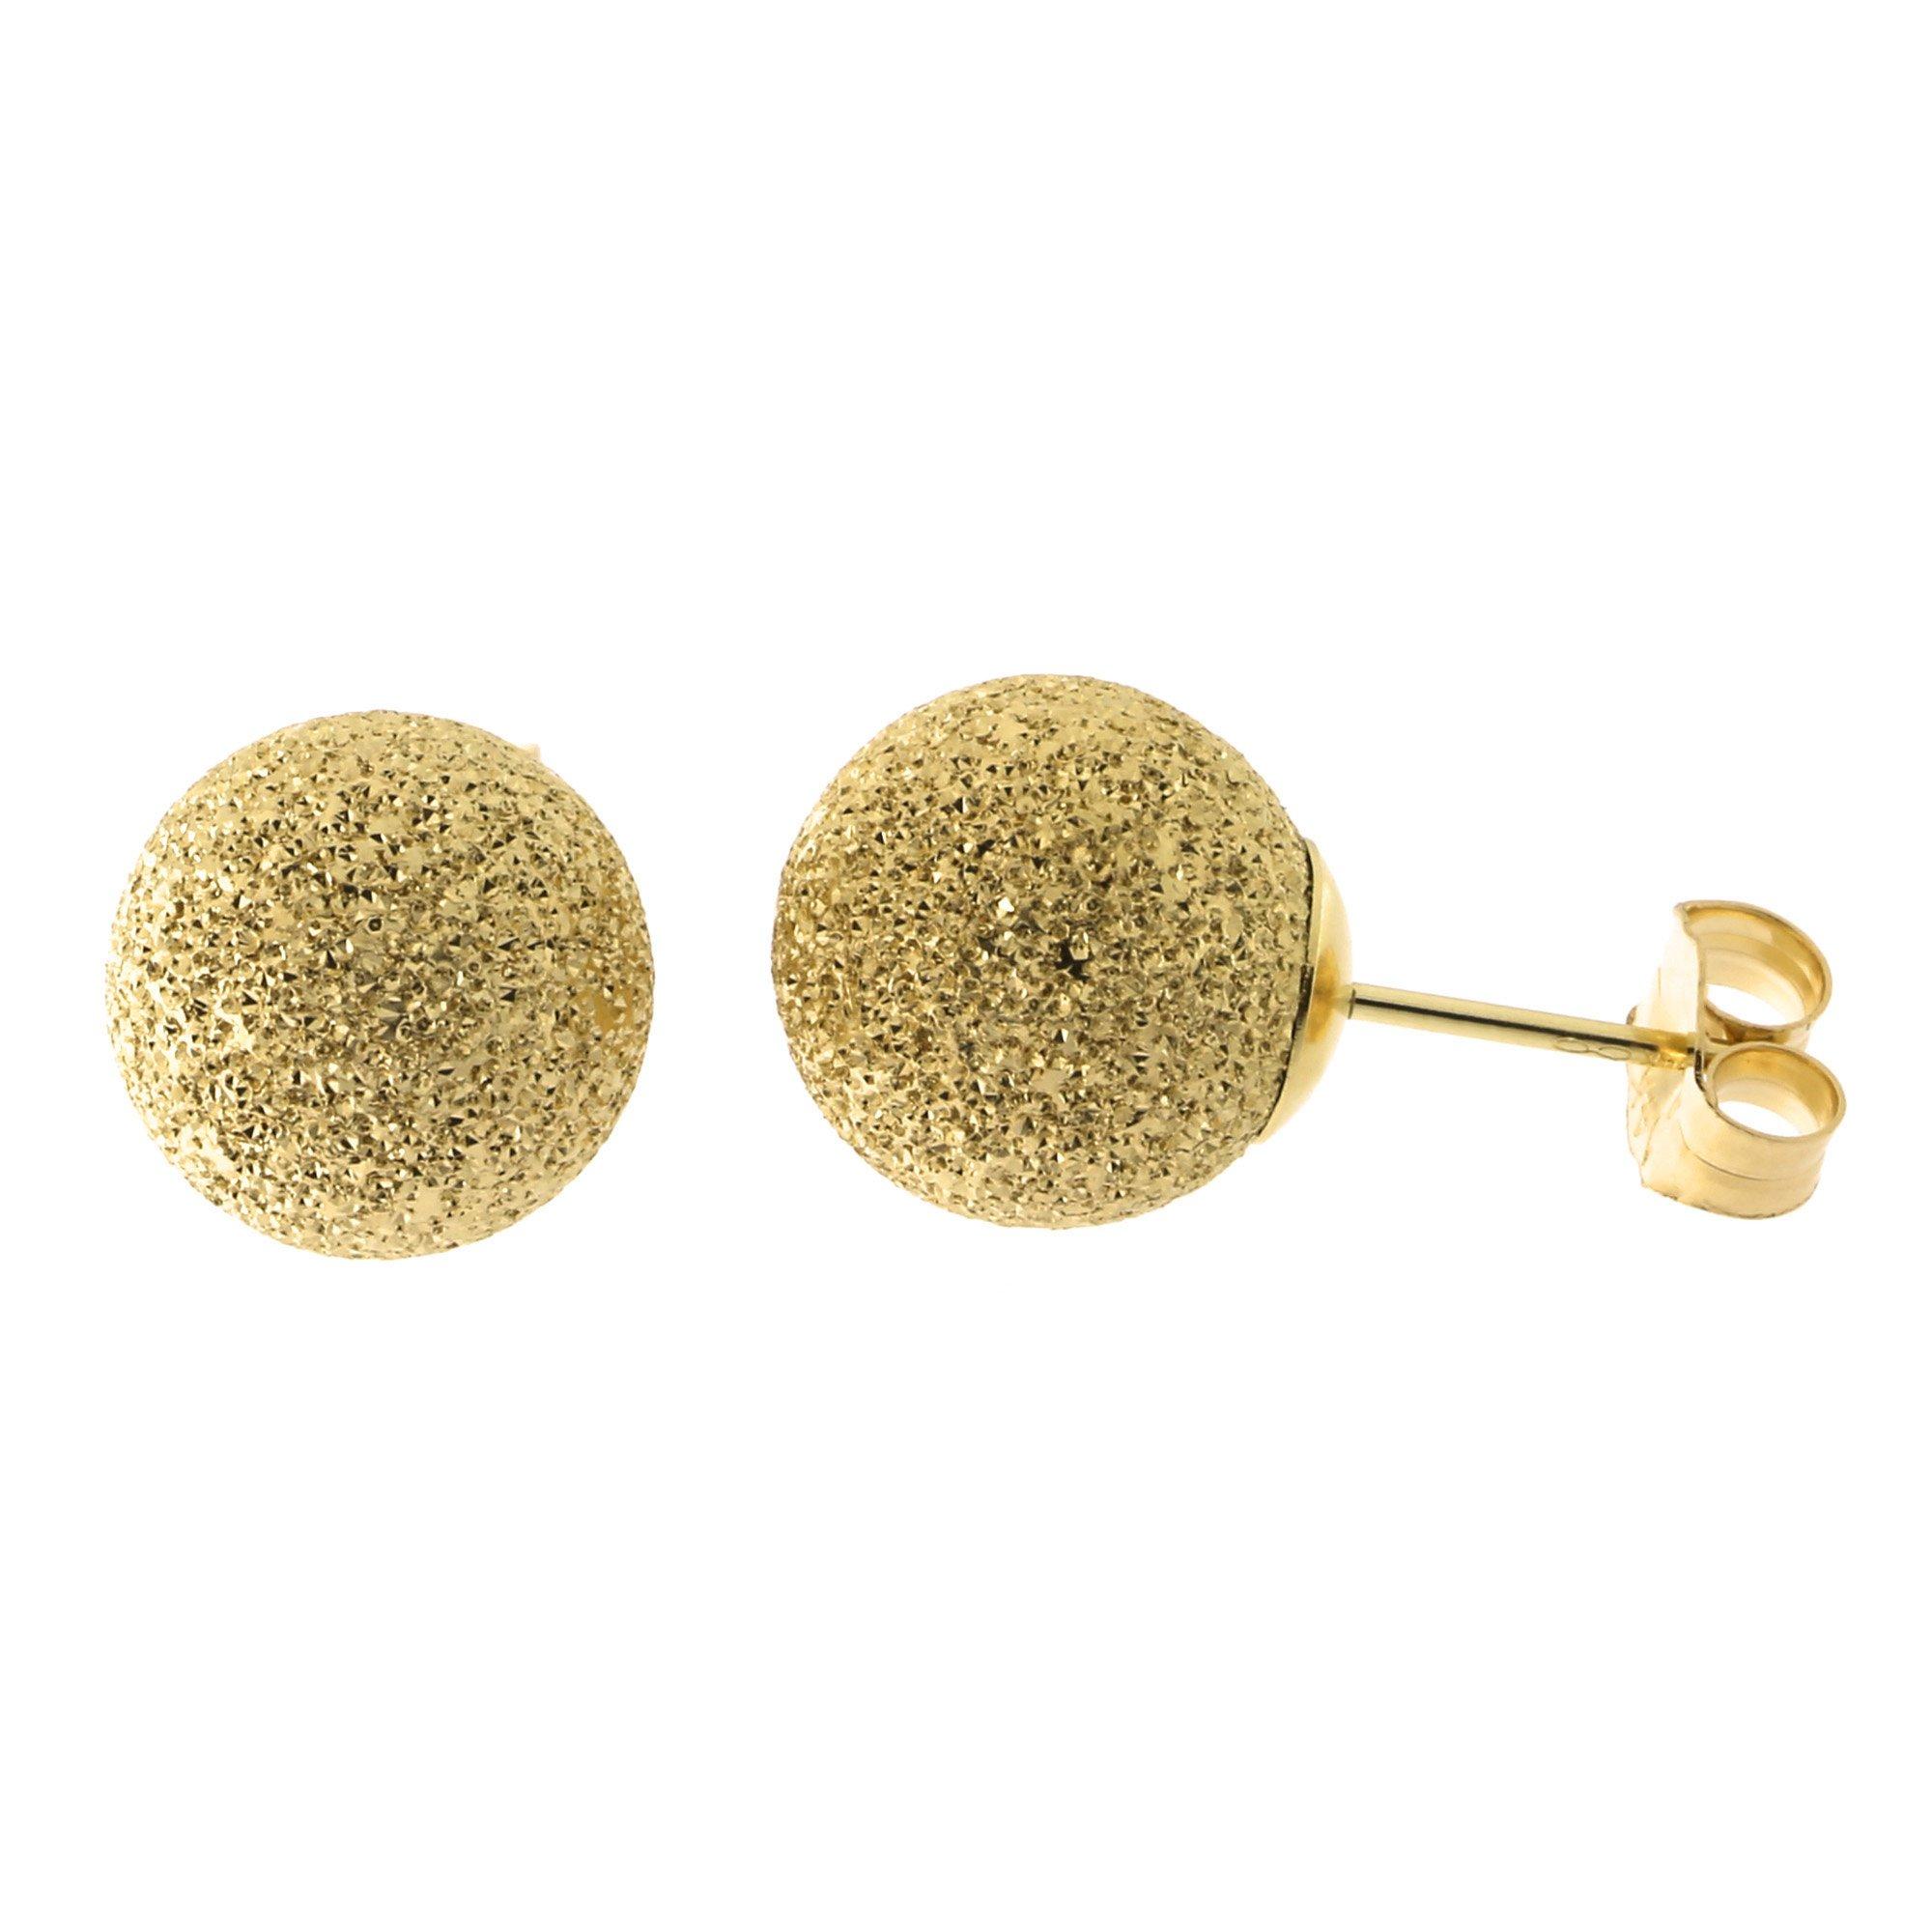 14k Yellow Gold Sparkling Diamond-cut Ball Stud Earrings - 9mm